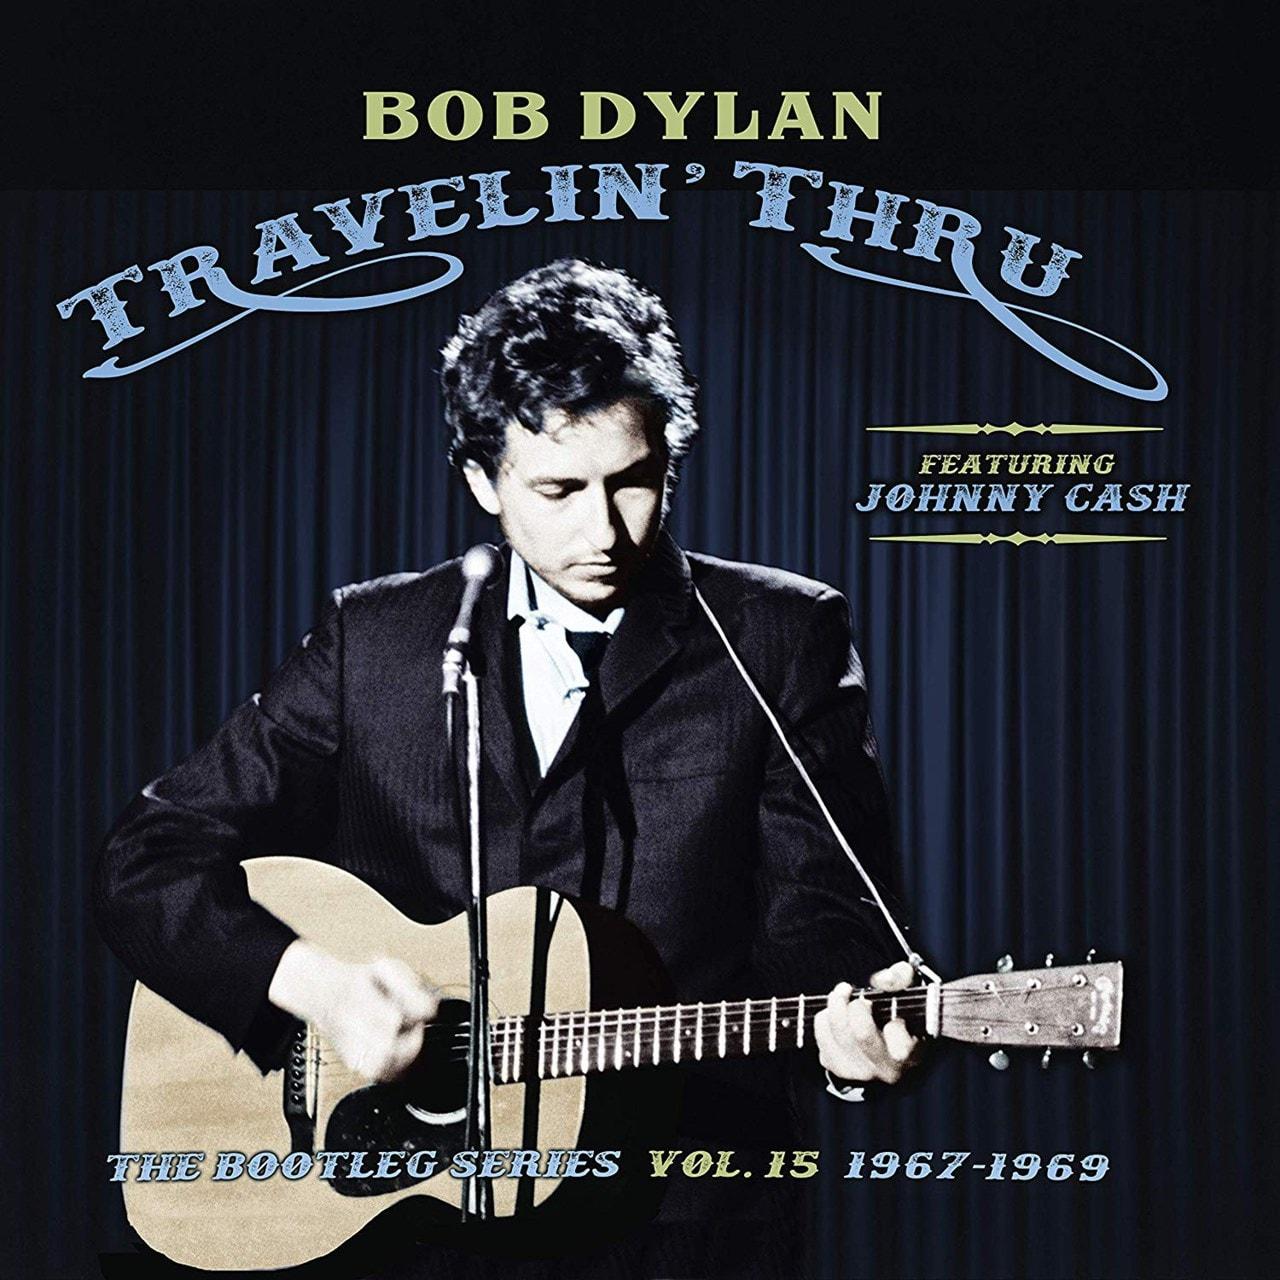 Travelin' Thru Featuring Johnny Cash: 1967-1969 - 1